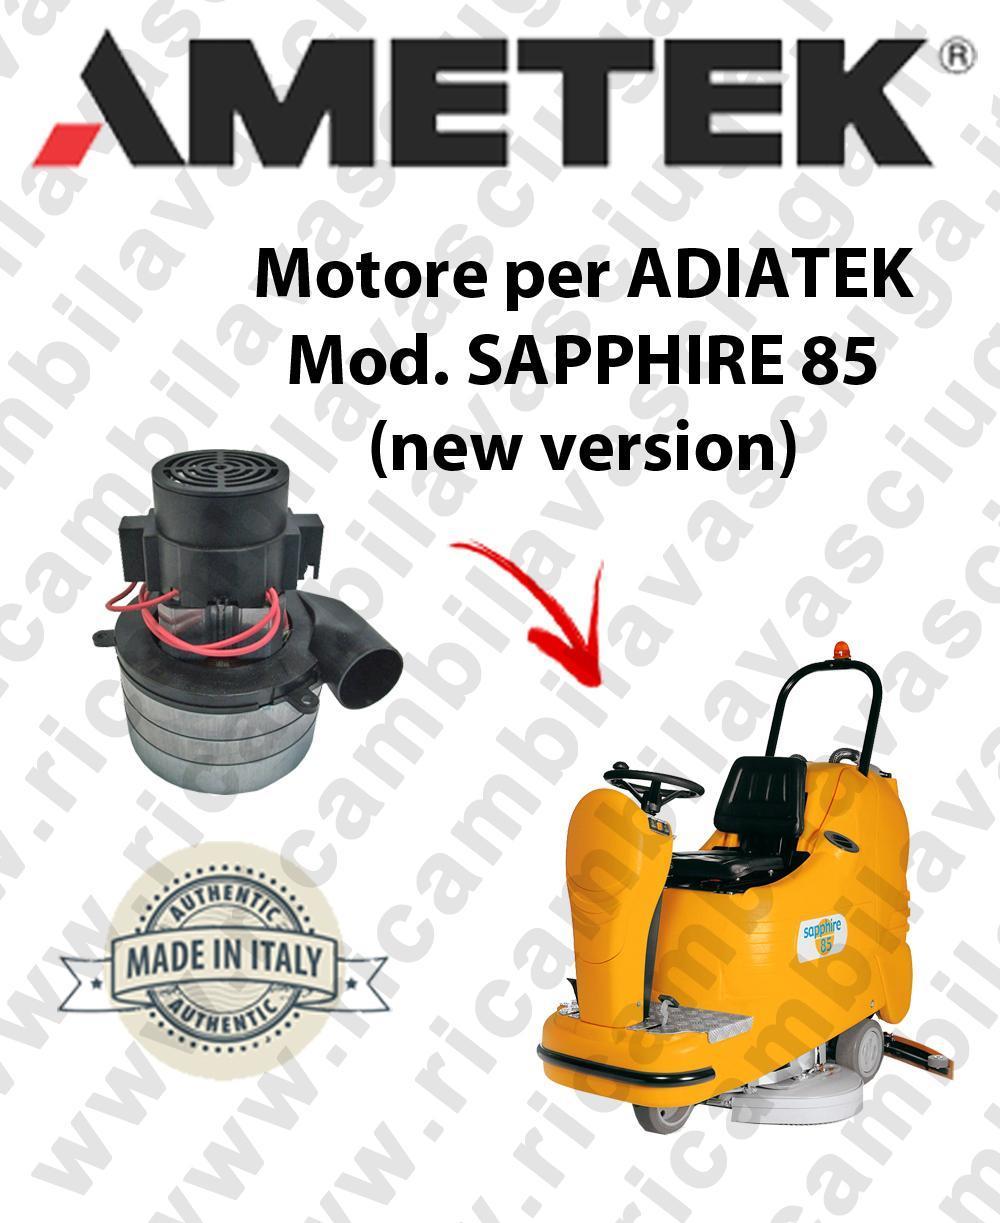 Sapphire 85 (new version) Motore de aspiración Ametek Italia  para fregadora Adiatek